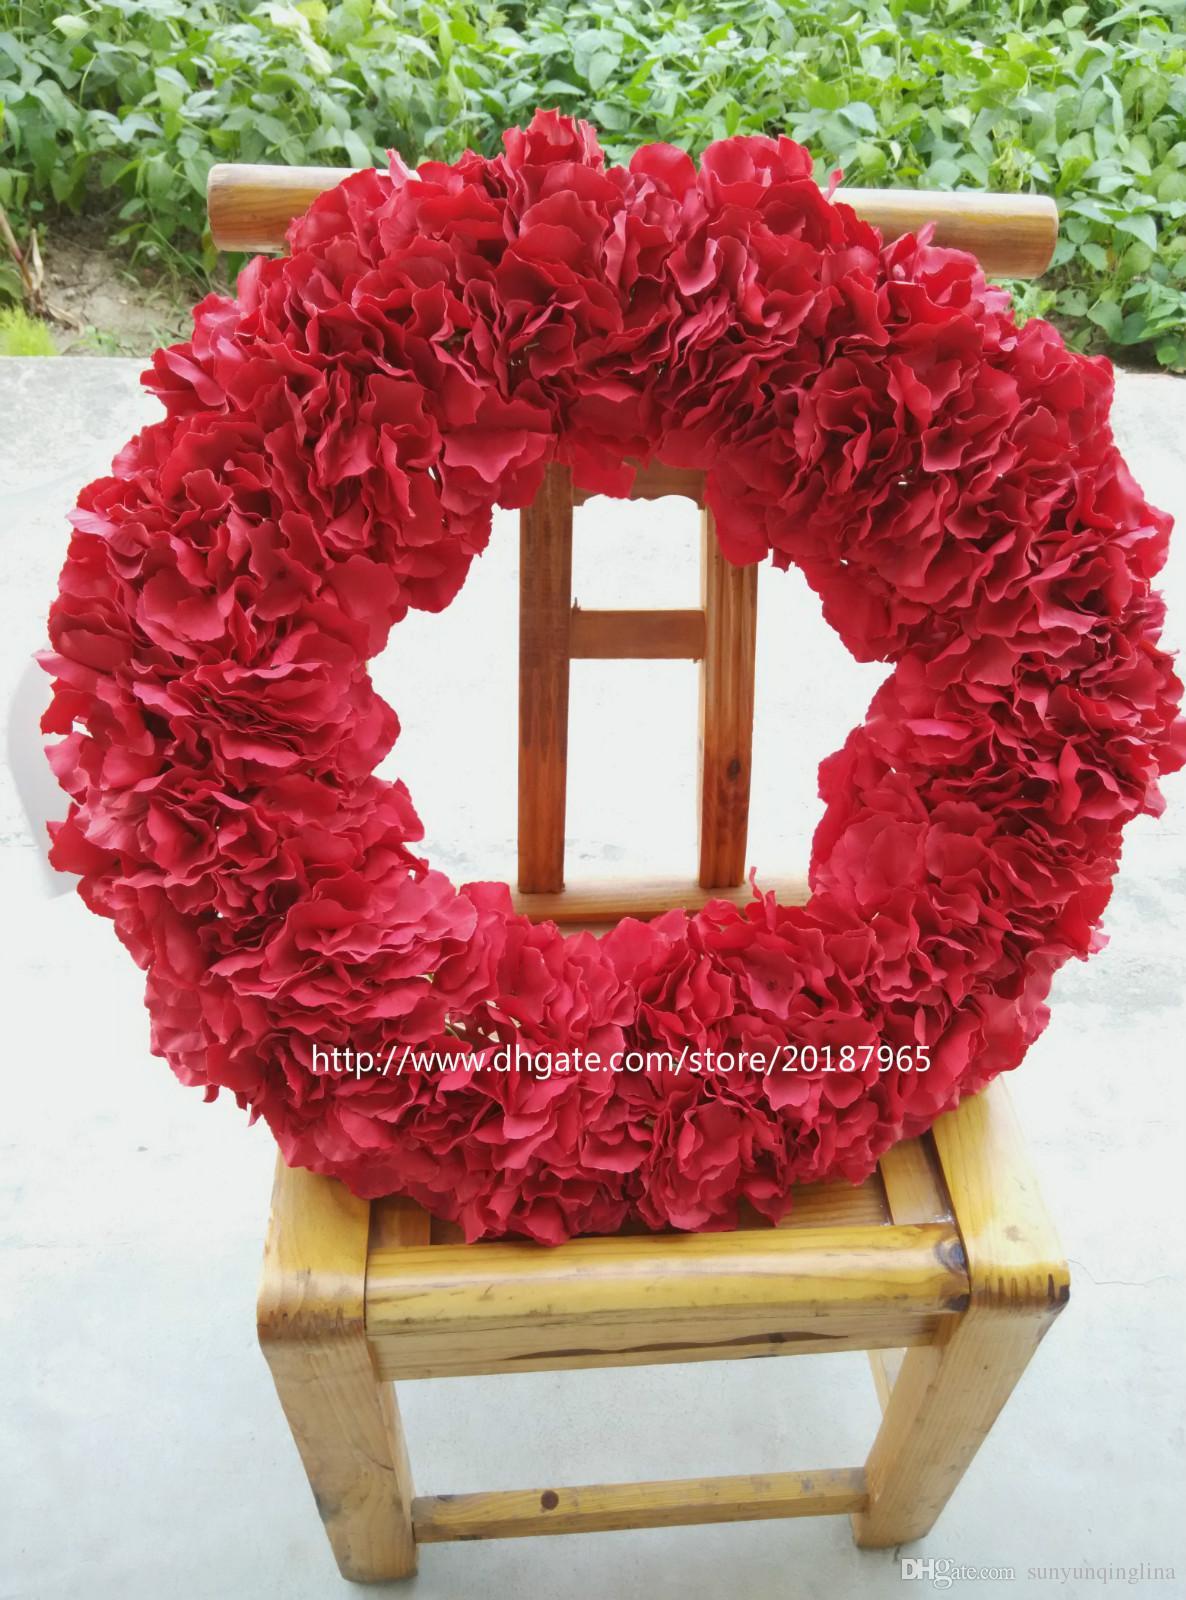 2018 Hot Red Hydrangea Wreath 20 Inches Winter Spring Wreath Xmas Wreath  Front Door Mounted Wreath Wedding U0026 From Sunyunqinglina, $71.36   Dhgate.Com